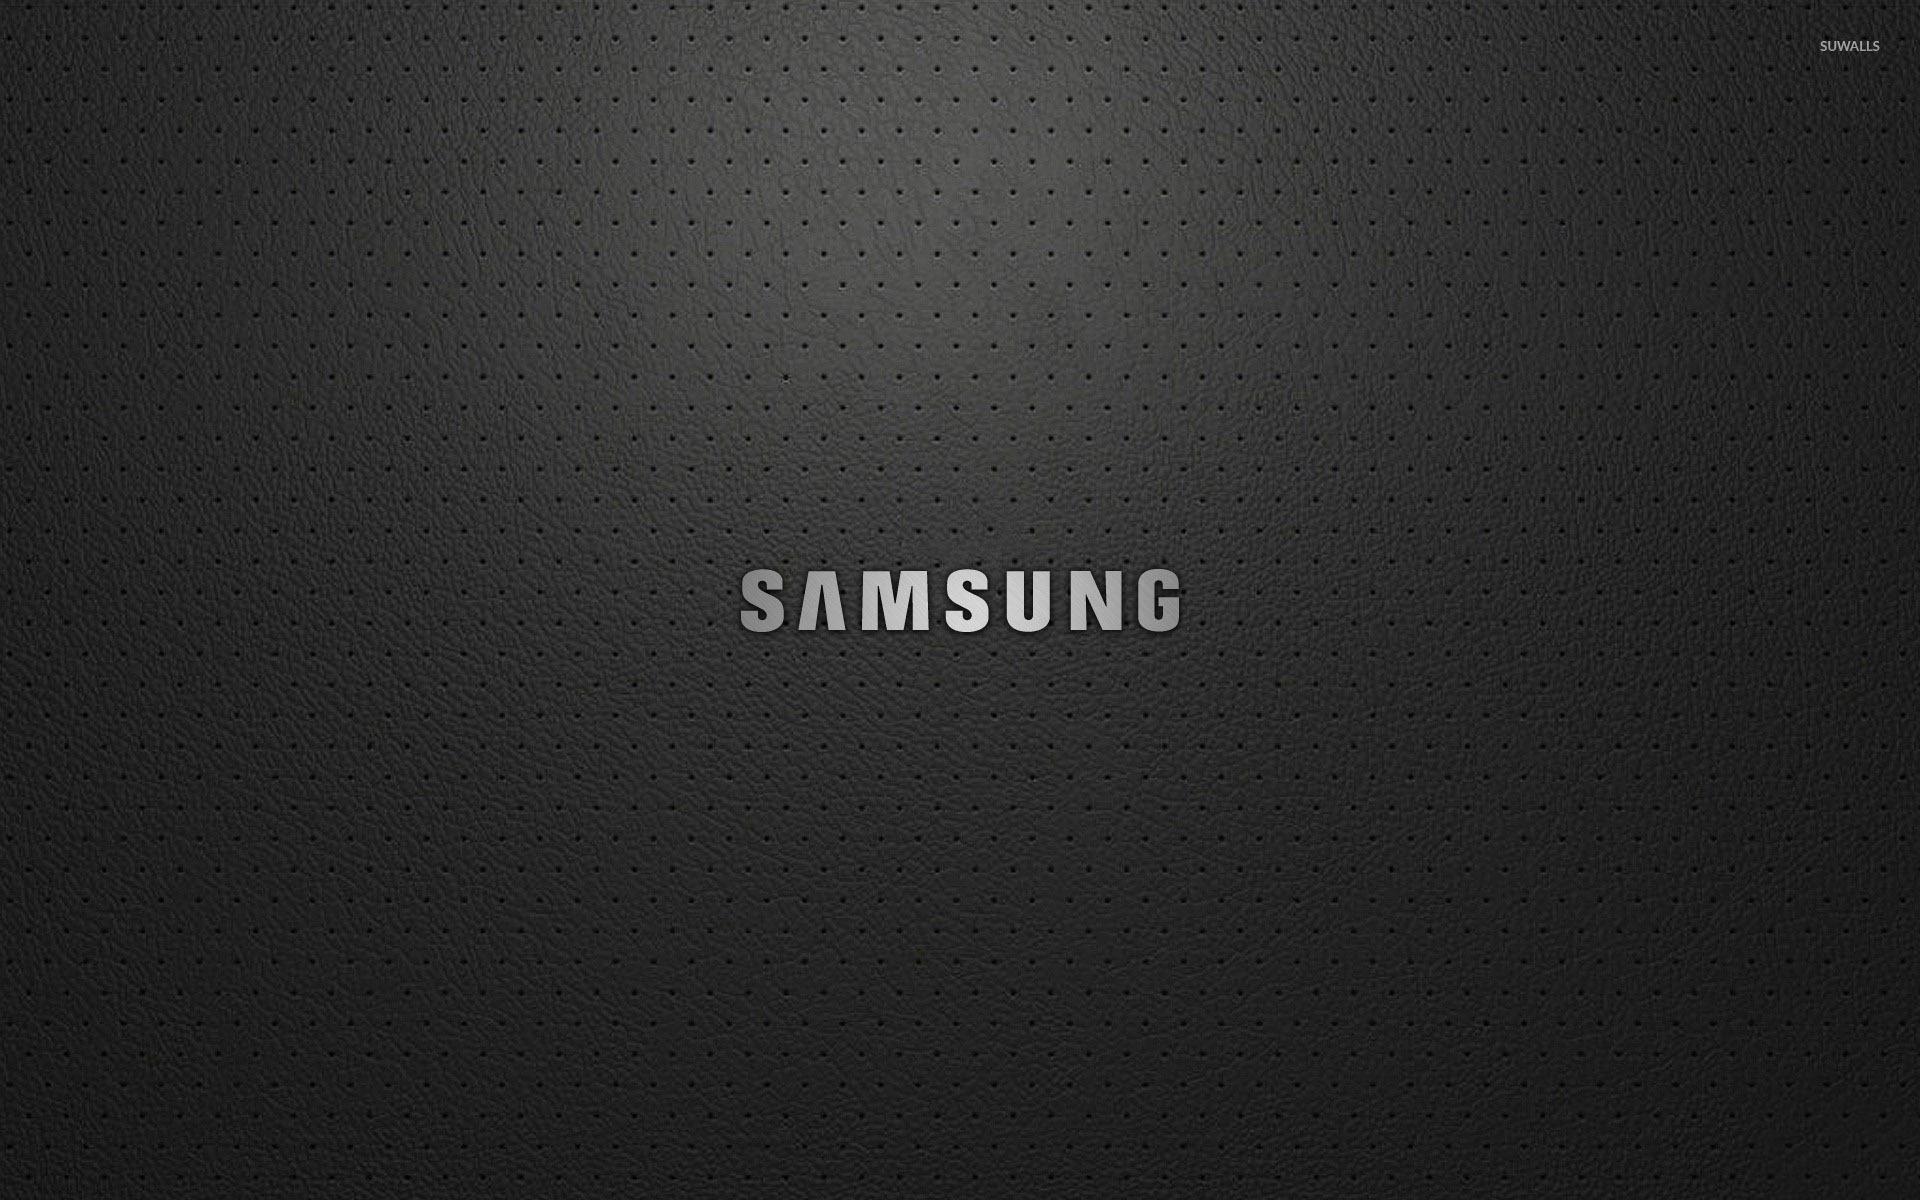 Samsung Galaxy S7 Edge Fall Wallpaper Samsung 2 Wallpaper Computer Wallpapers 27837